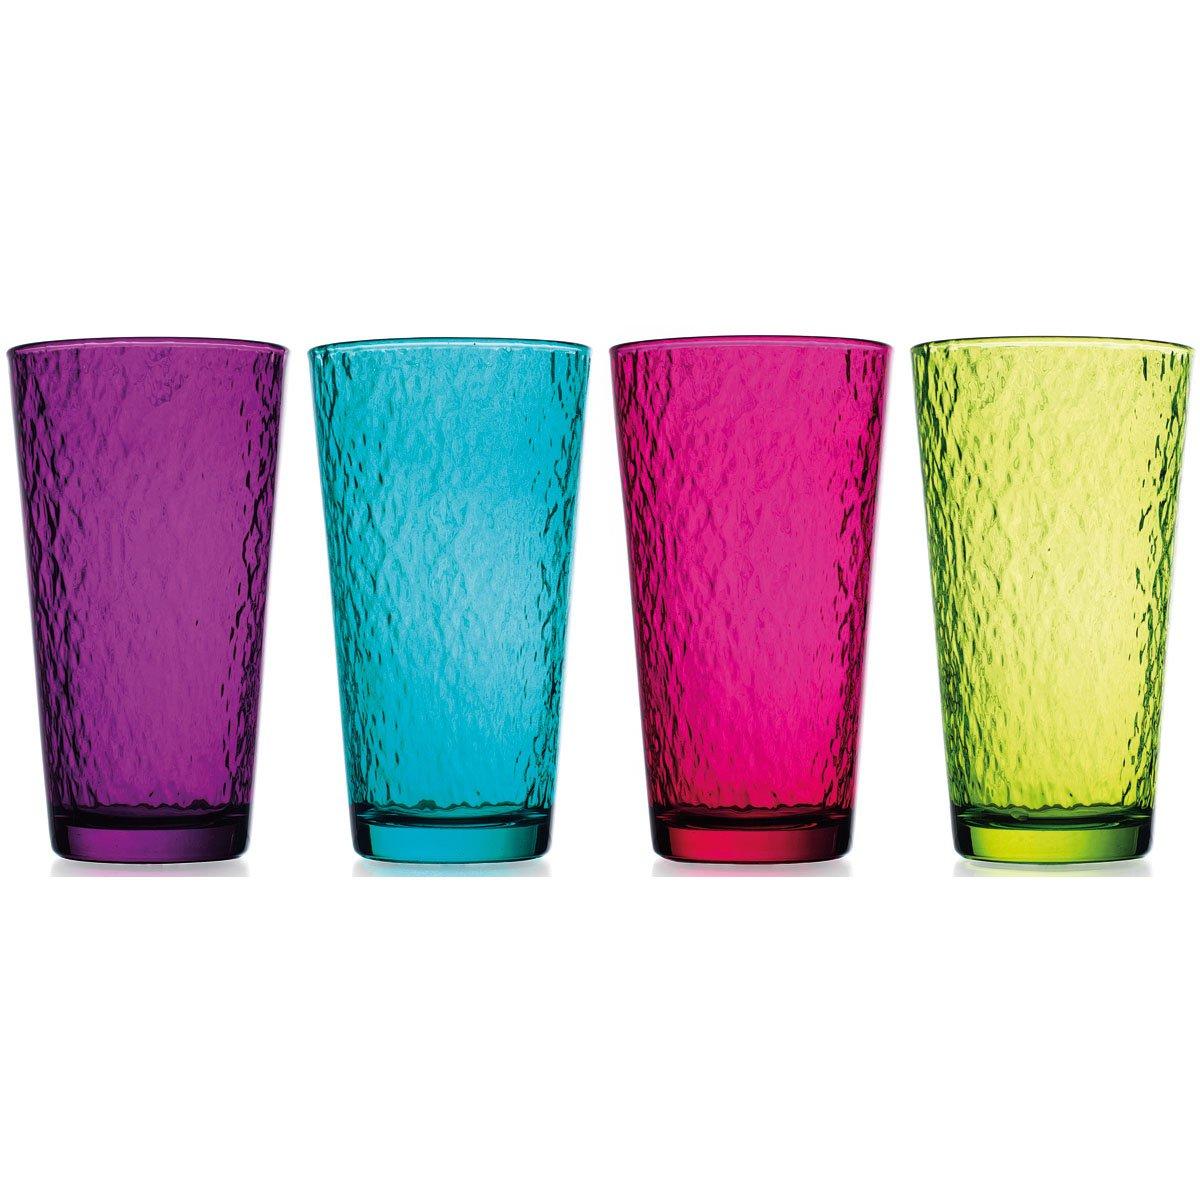 Vasos de colores hammered 4 colores a elegir sears com - Vasos de colores ...